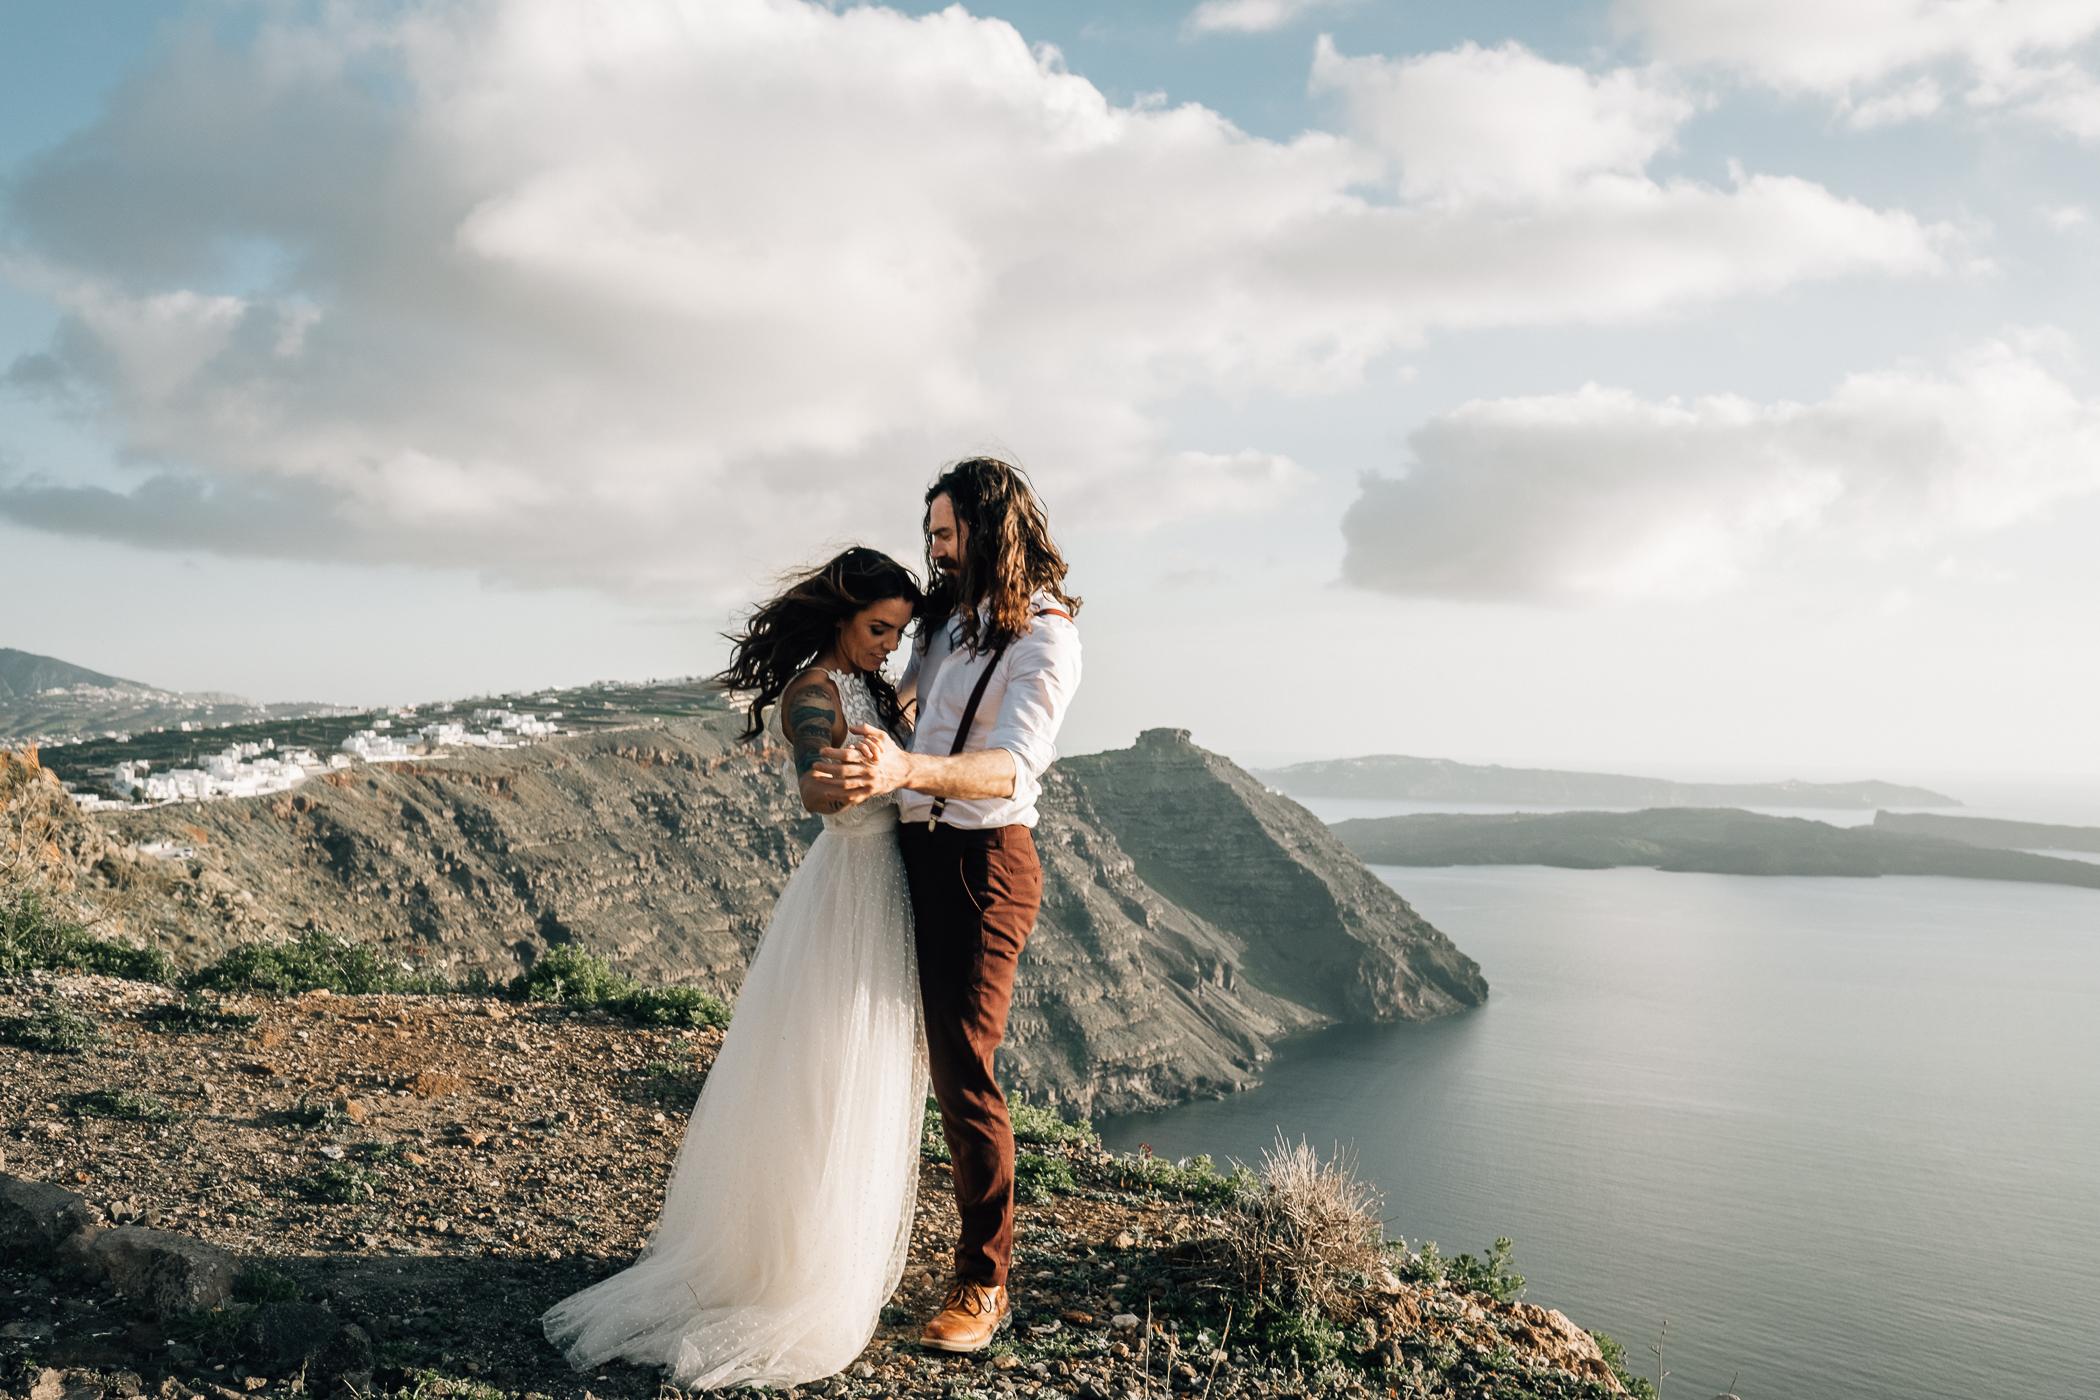 Collinmgwood wedding photographer.jpg